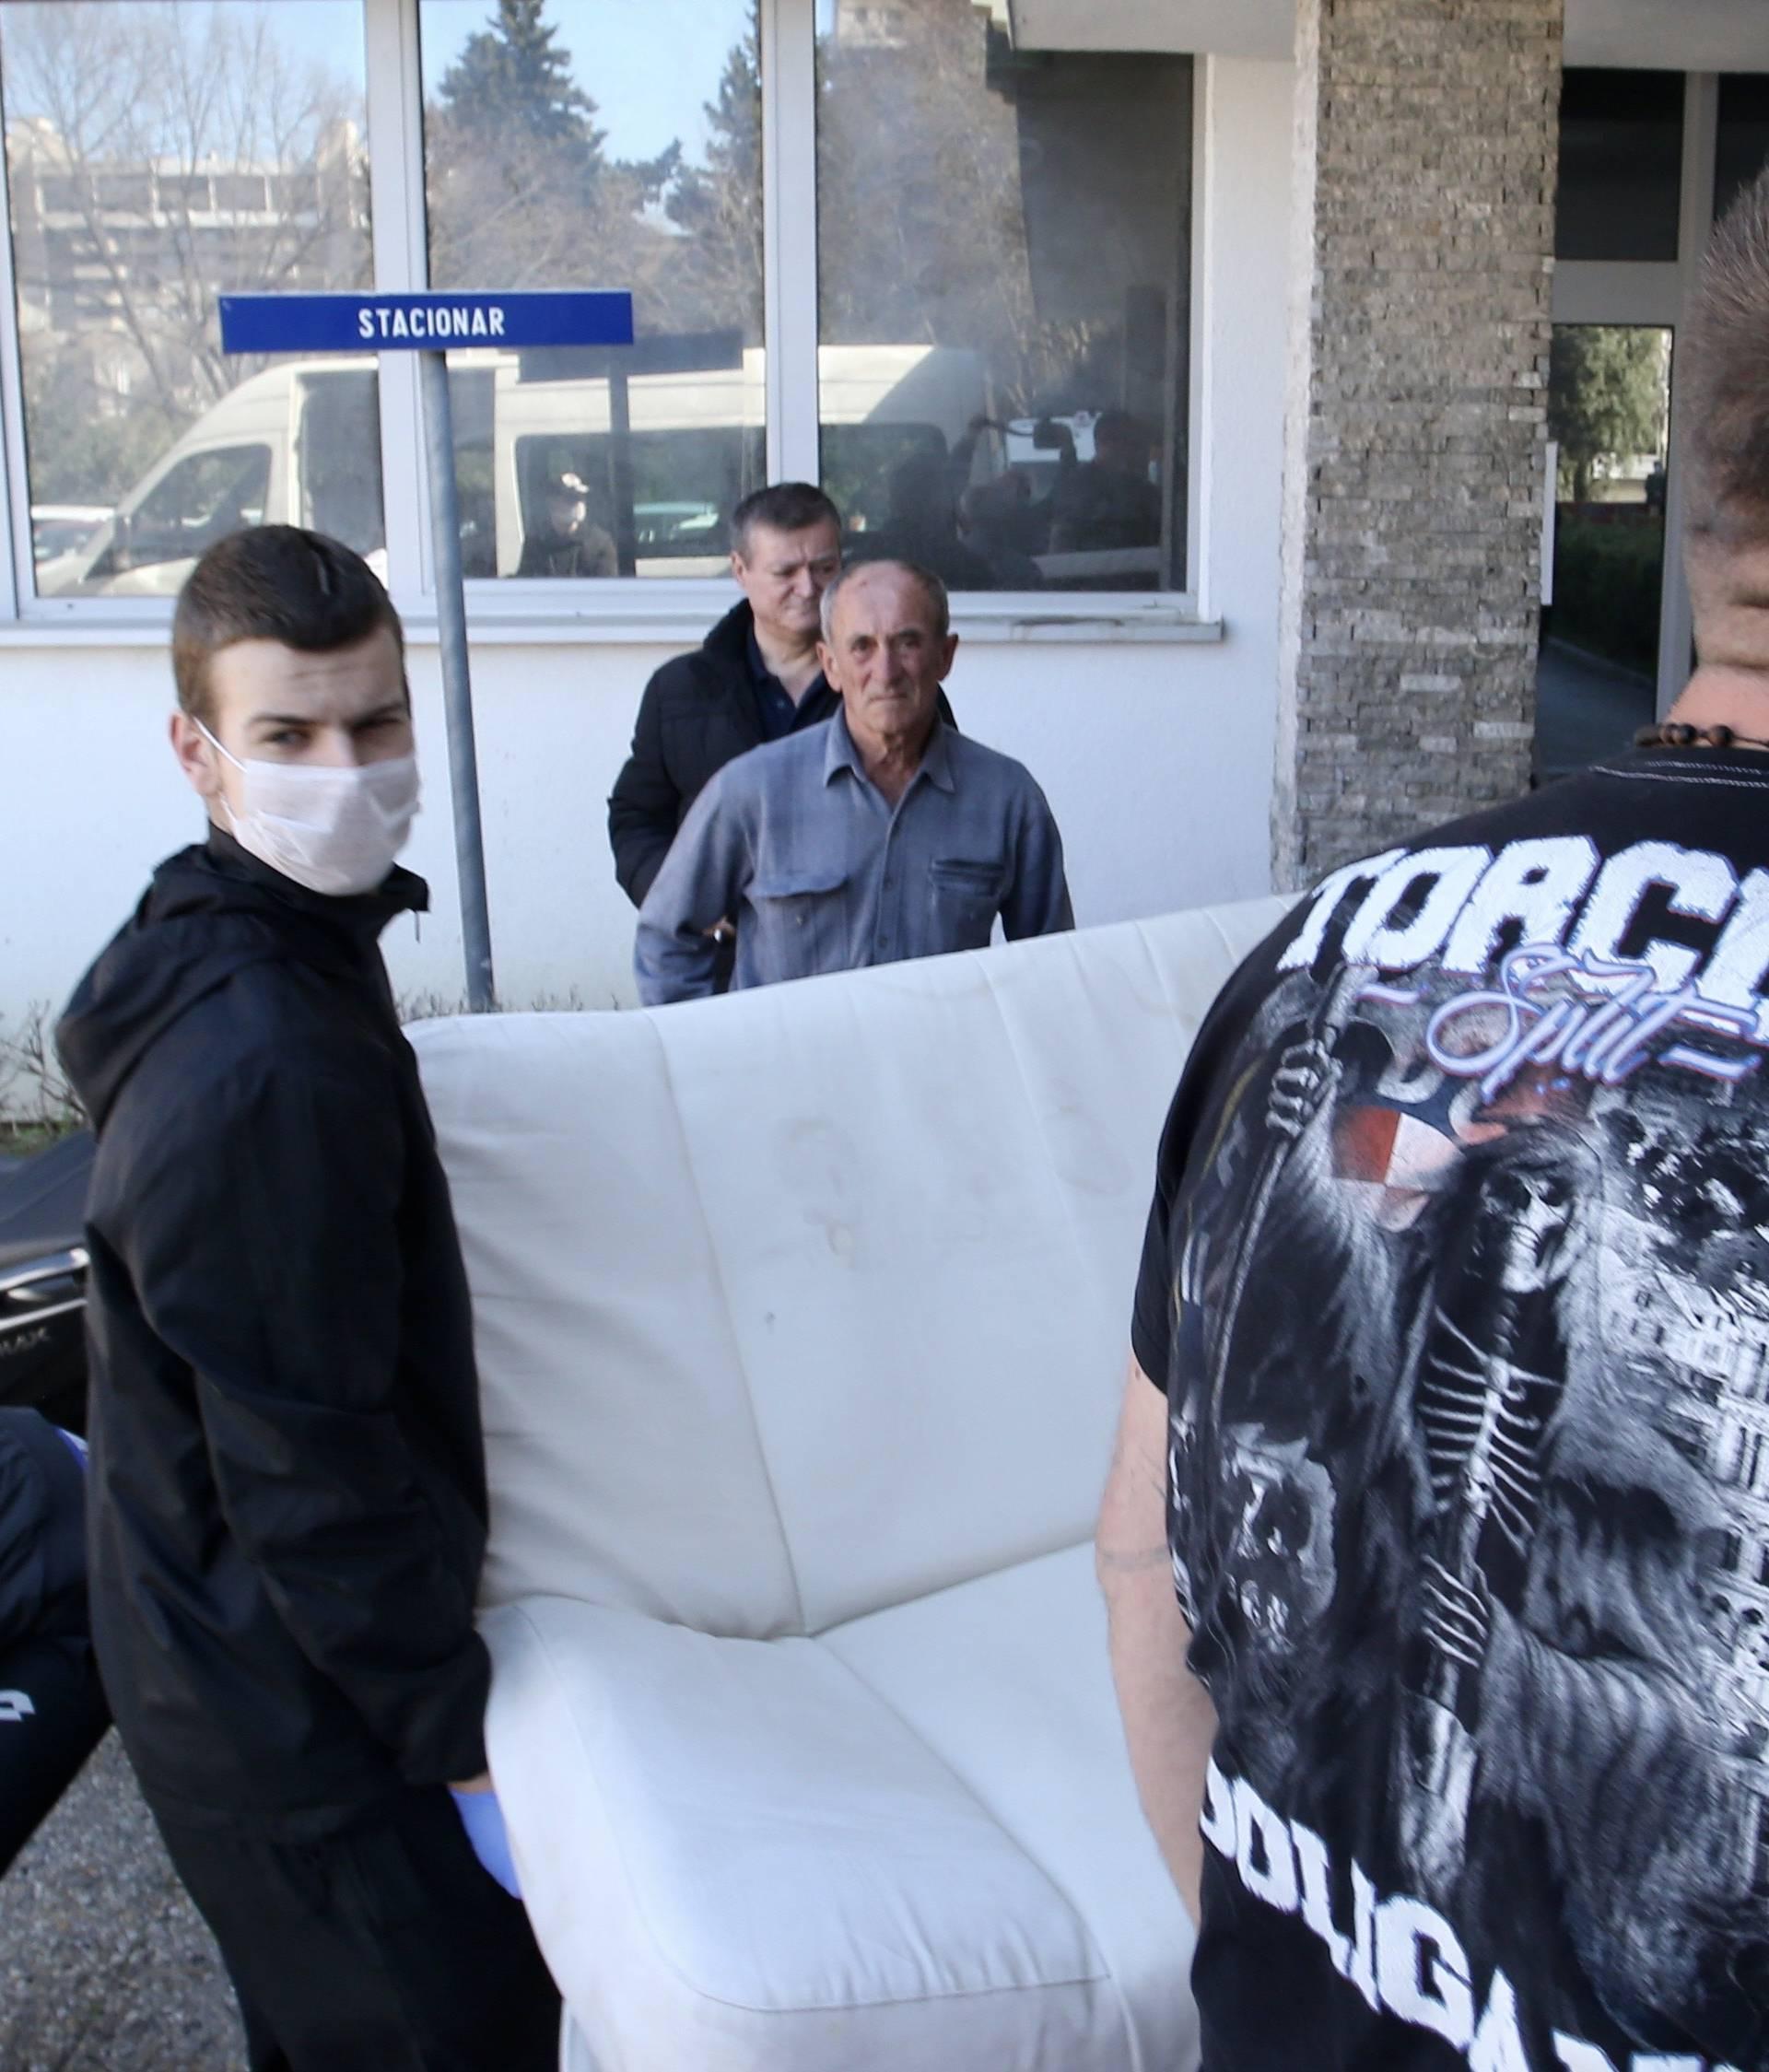 Split: Torcida stigla, pomaže pri selidbi bolnice Križine na Firule